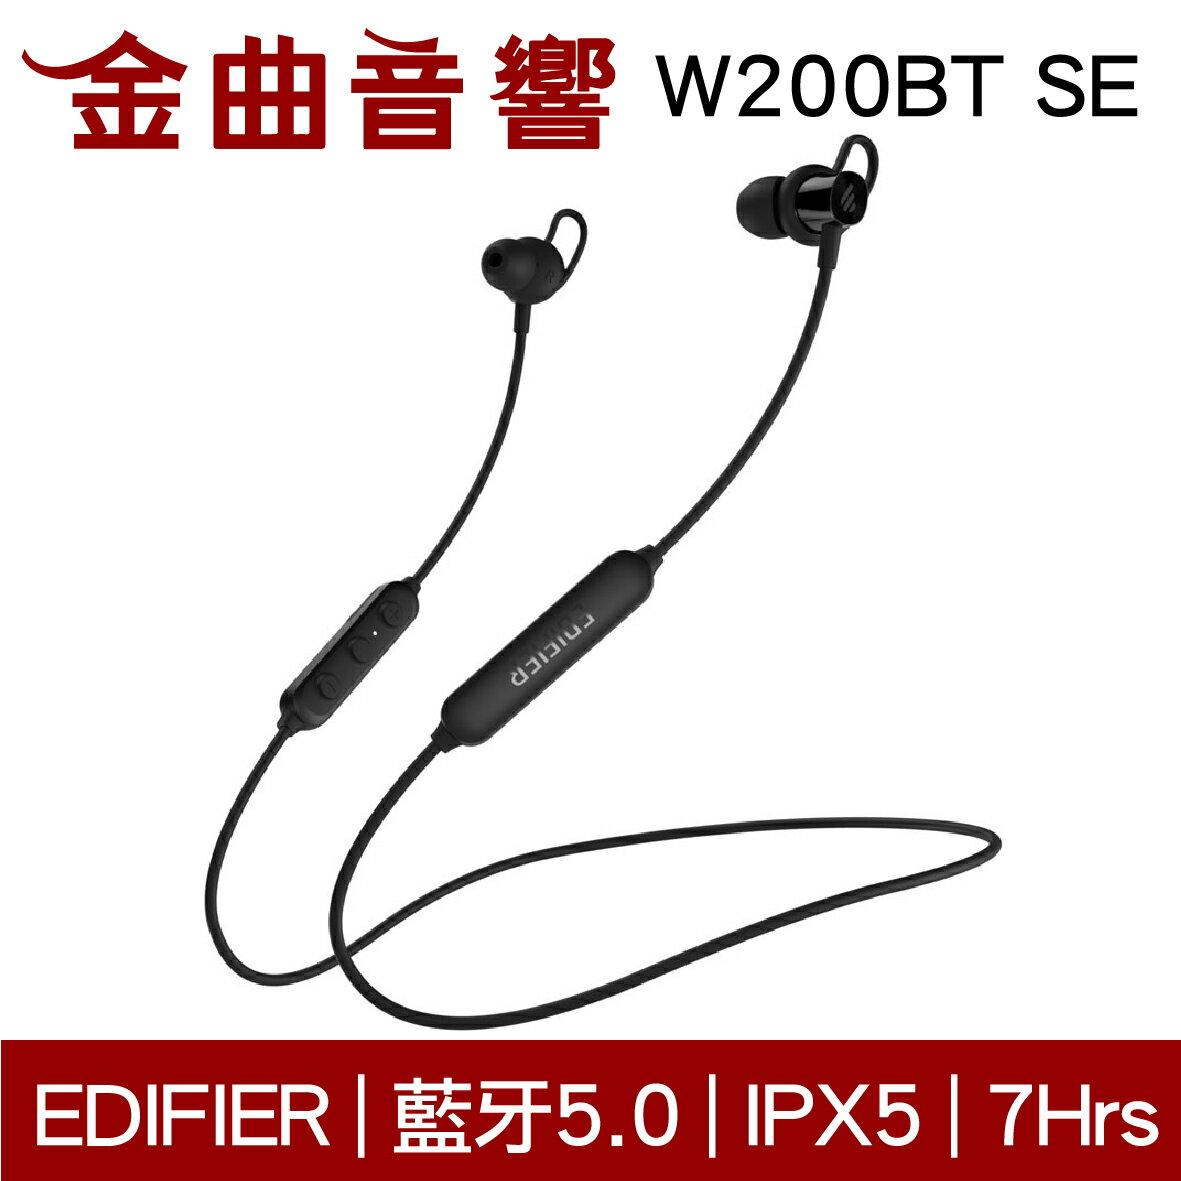 EDIFIER 漫步者 W200BT SE 黑色 線控 運動 頸掛式 藍牙 耳道式 耳機 | 金曲音響